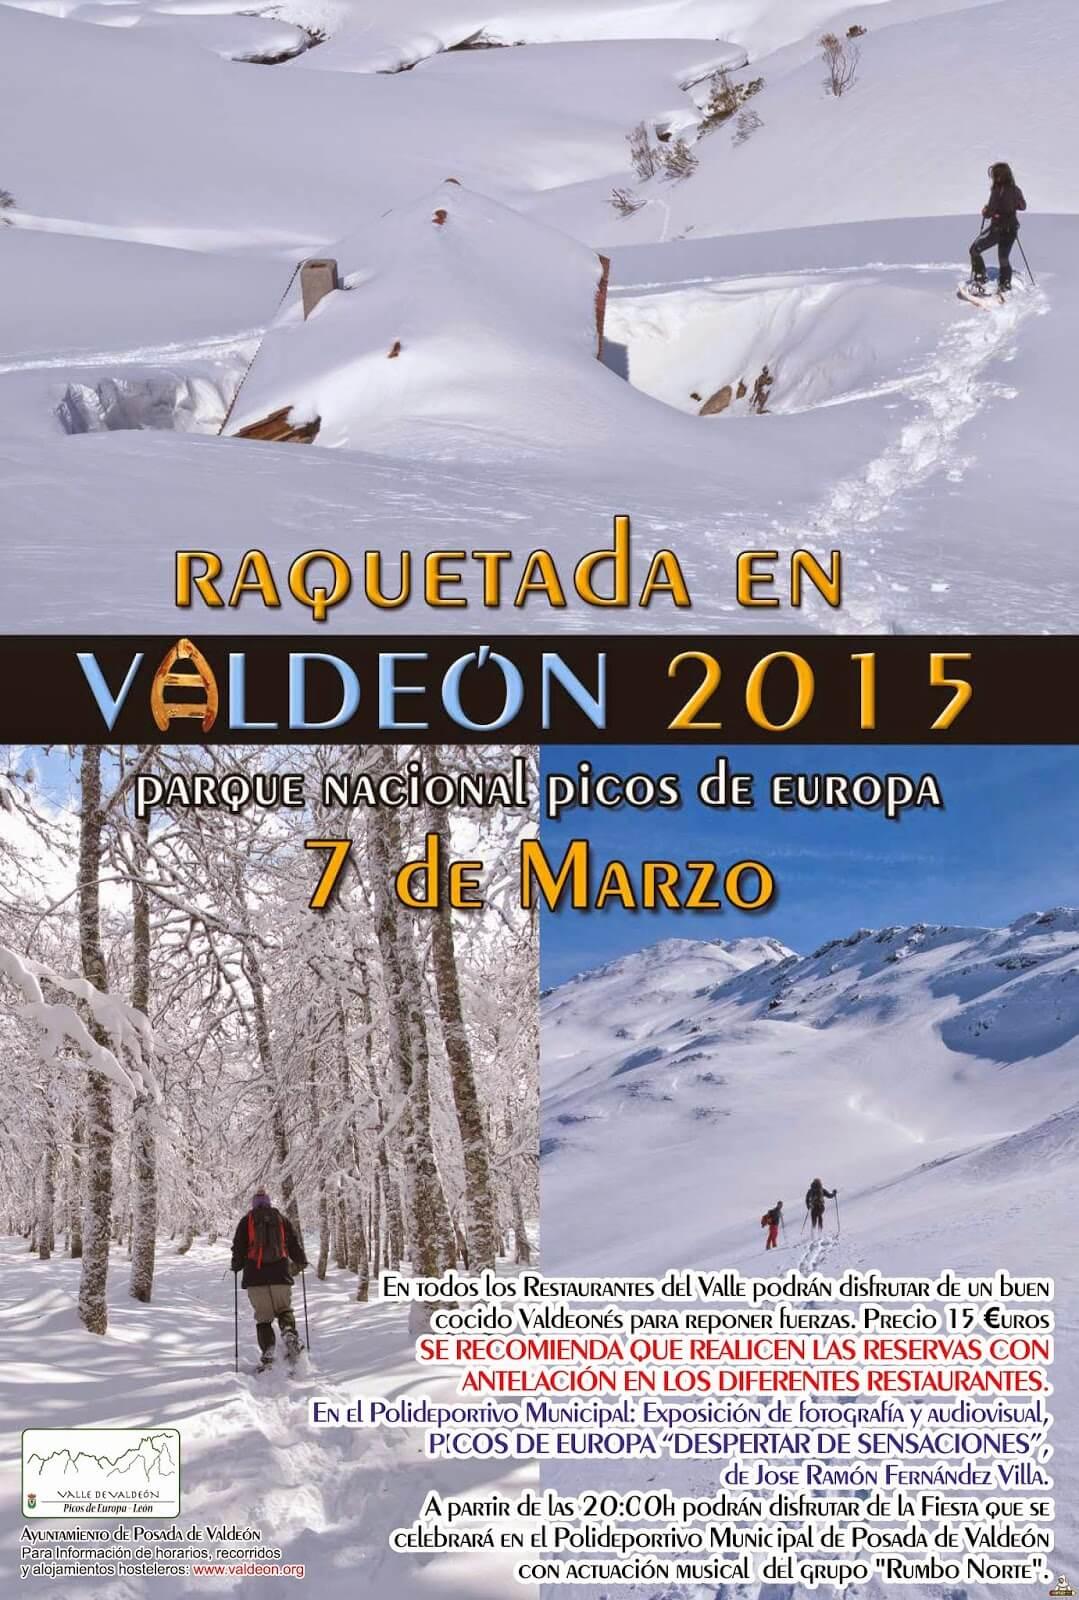 https://i0.wp.com/campingelcarespicosdeeuropa.com/wp-content/uploads/2015/02/cartelraquetas2015-1.jpg?fit=1079%2C1600